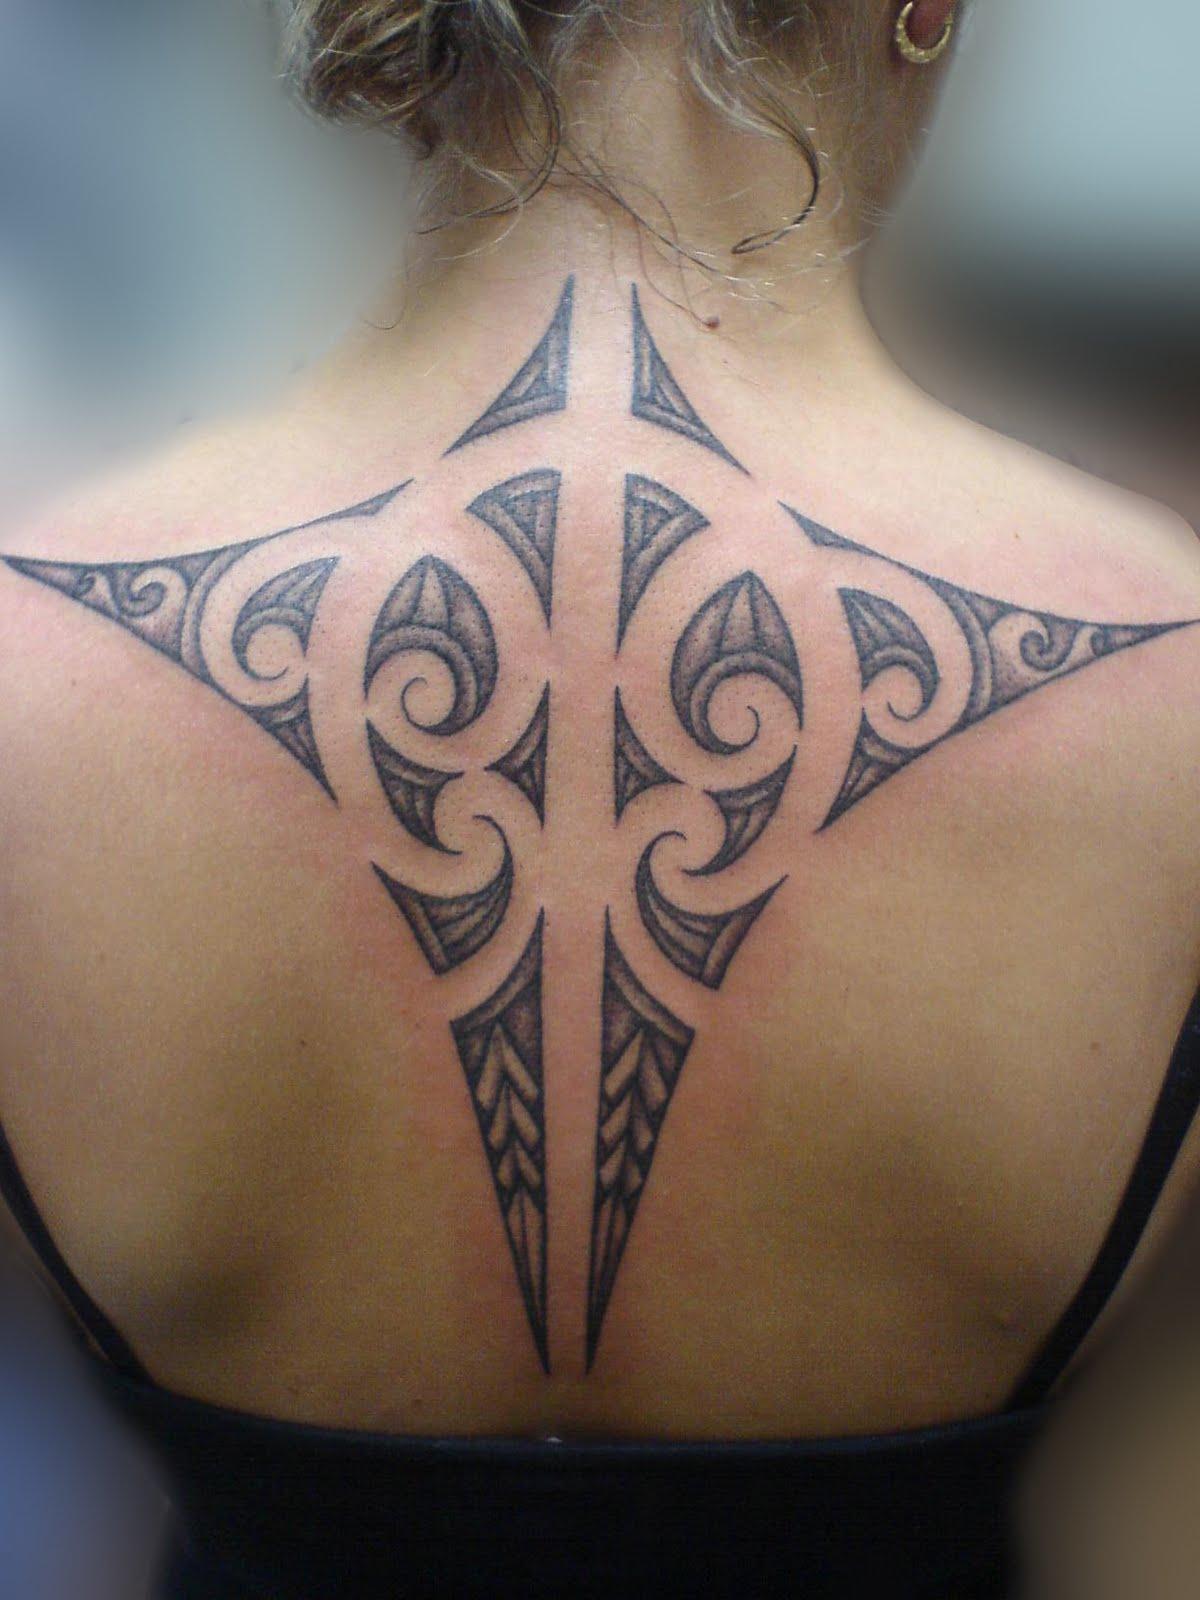 Interesting Maori Tattoo Designs For 2011 Maori Tattoo for Girls Back - YusraBlog.com